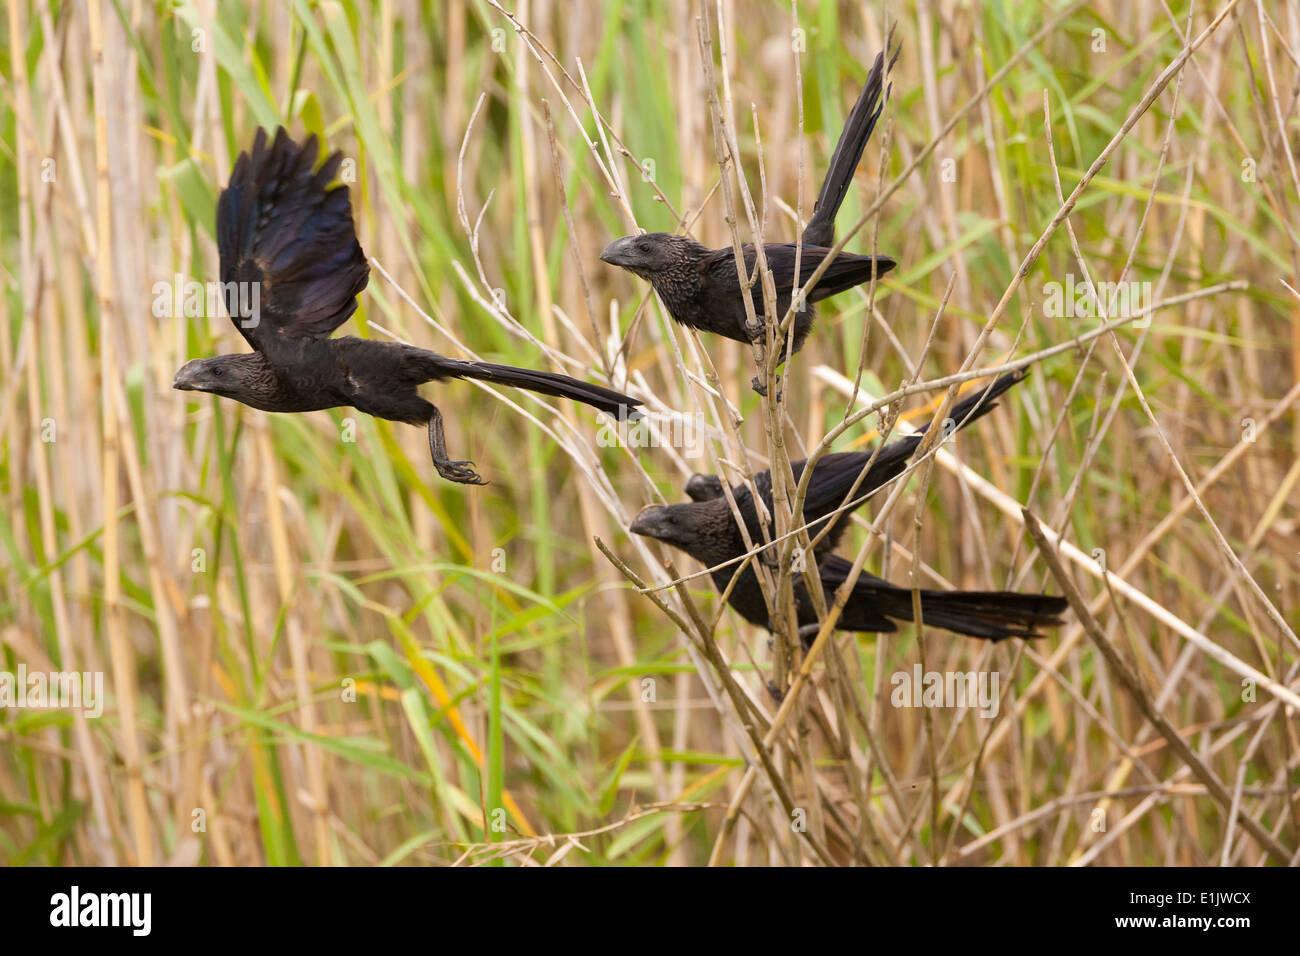 Smooth-billed Ani, Crotophaga ani, at the lakeside of Lago Gatun, Republic of Panama. - Stock Image